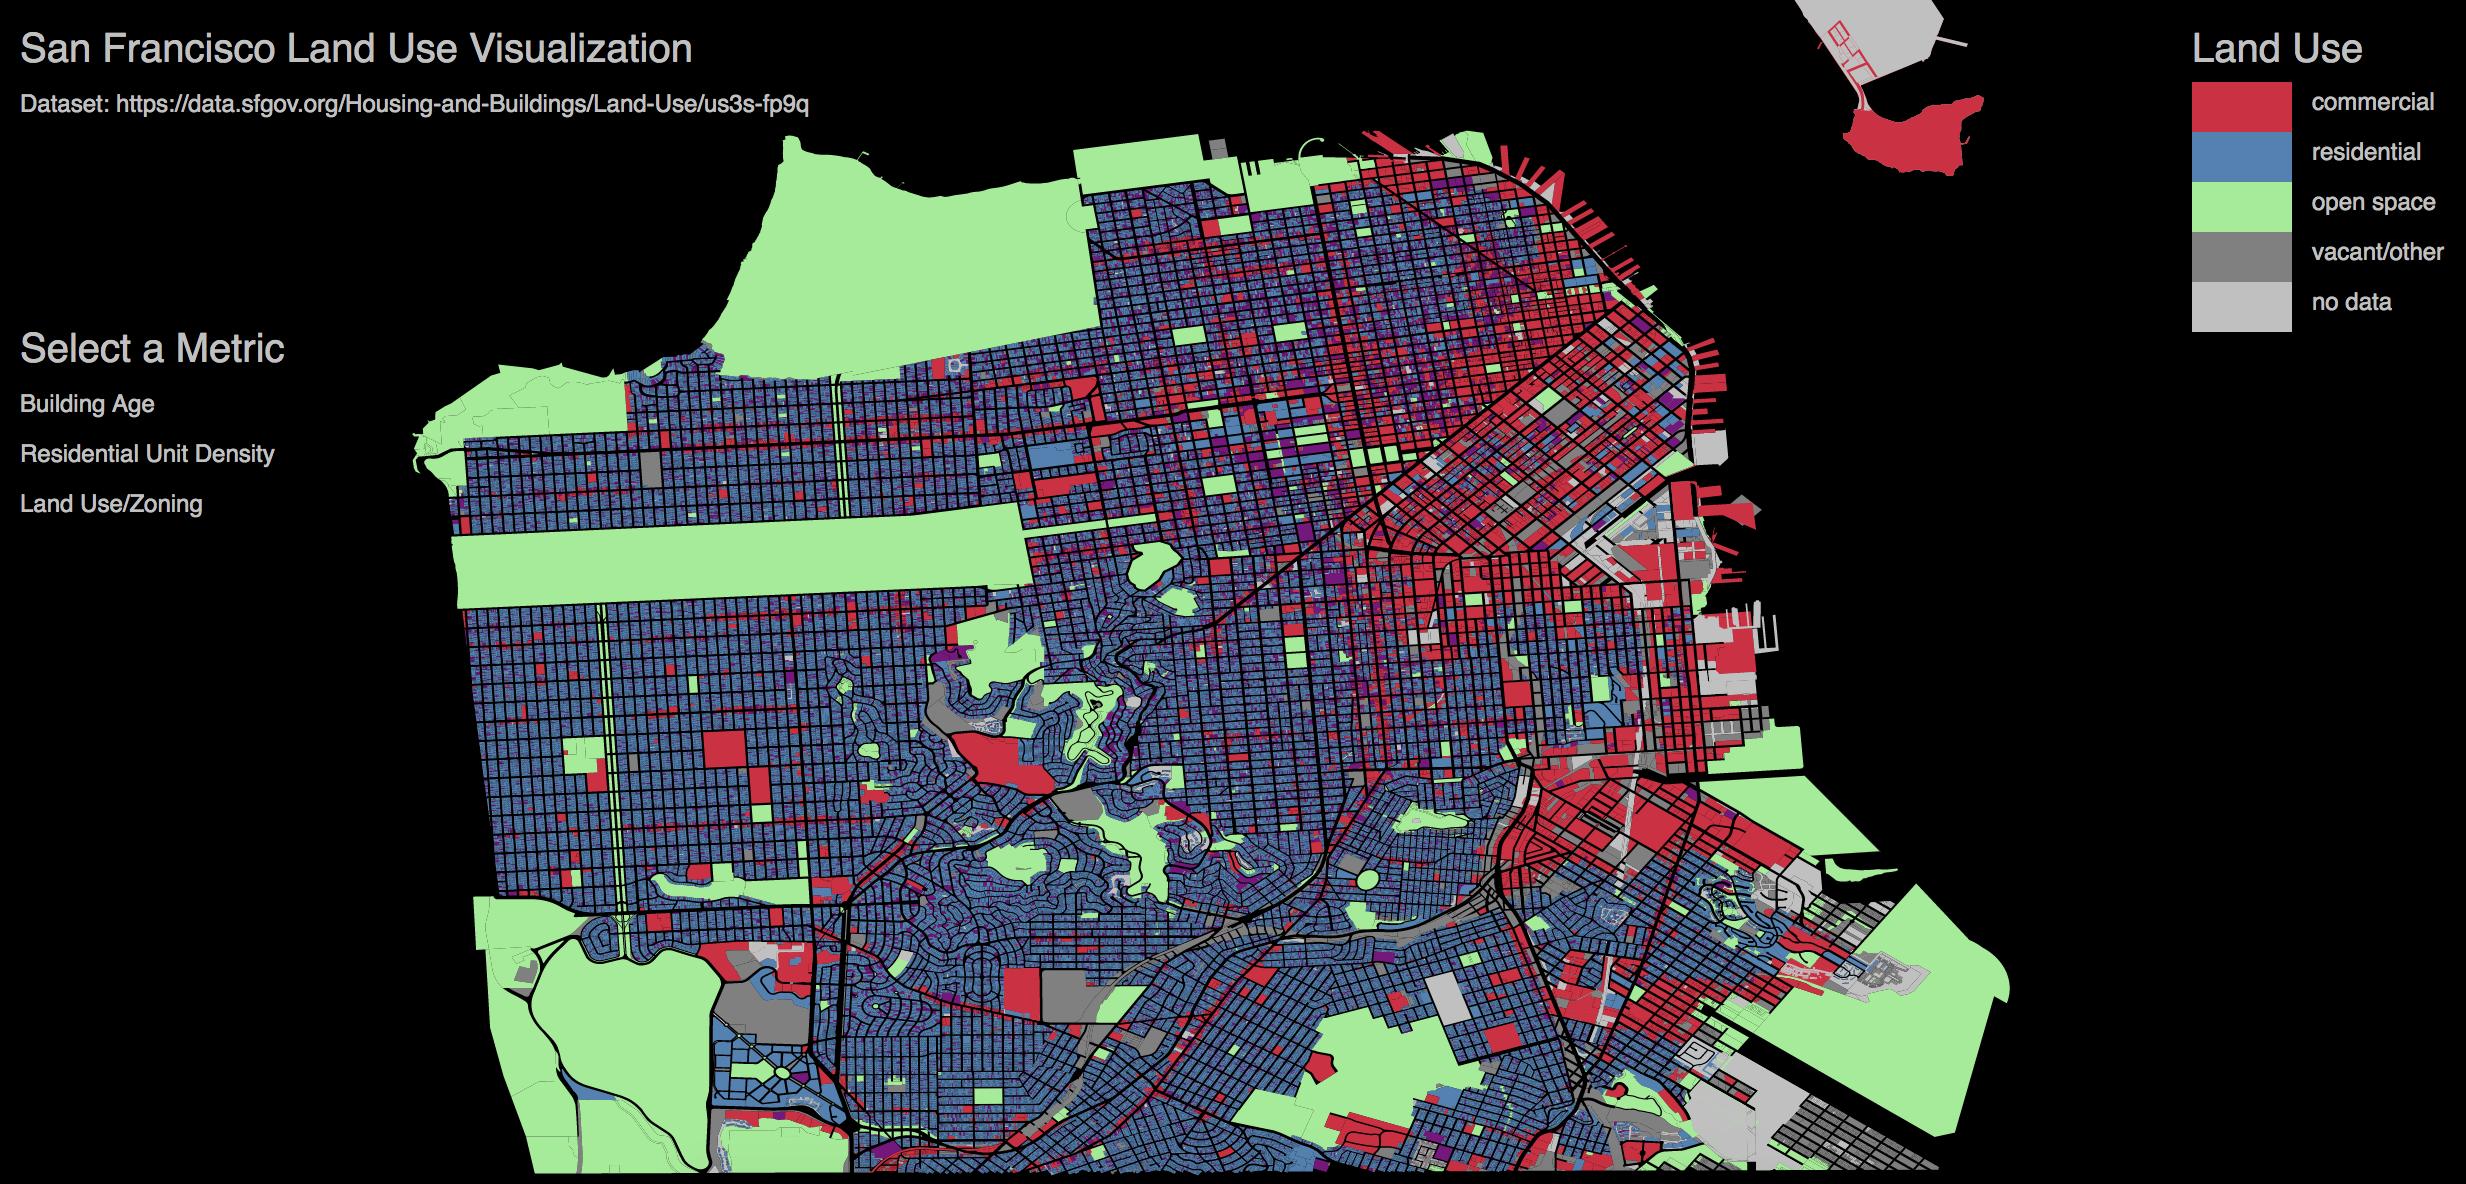 zoning in San Francisco